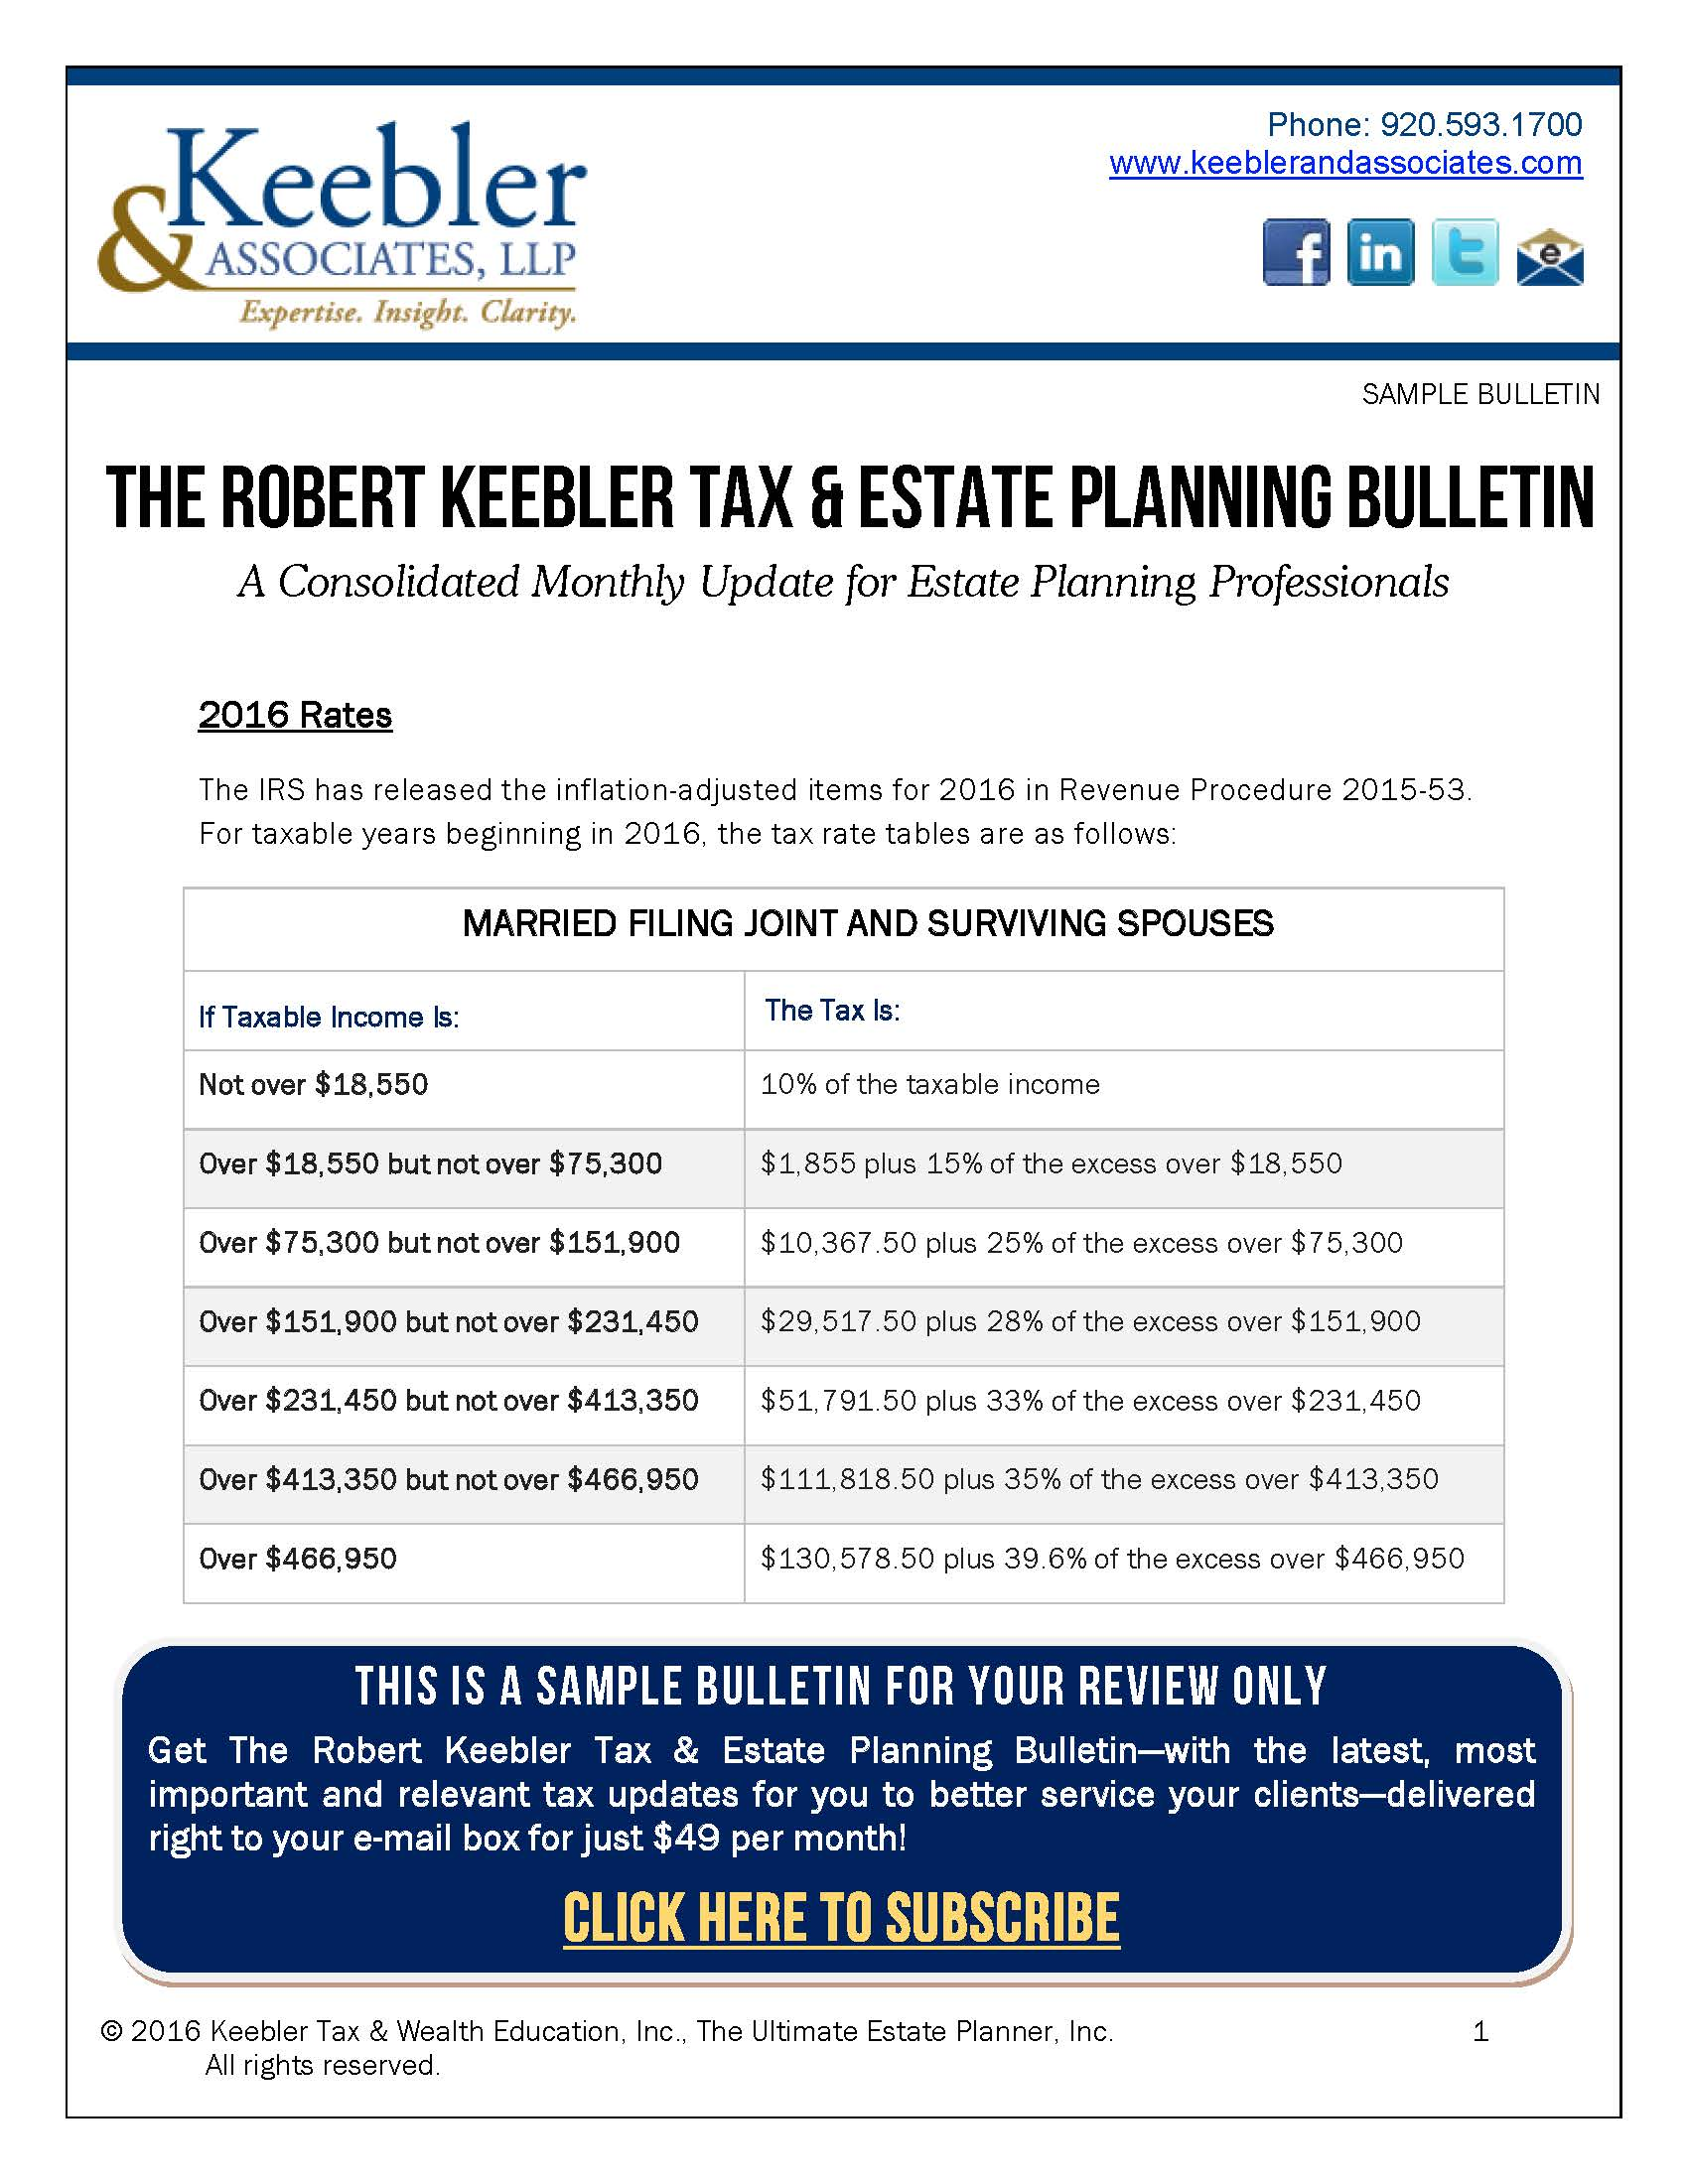 robert-keebler-estate-planning-newsletter